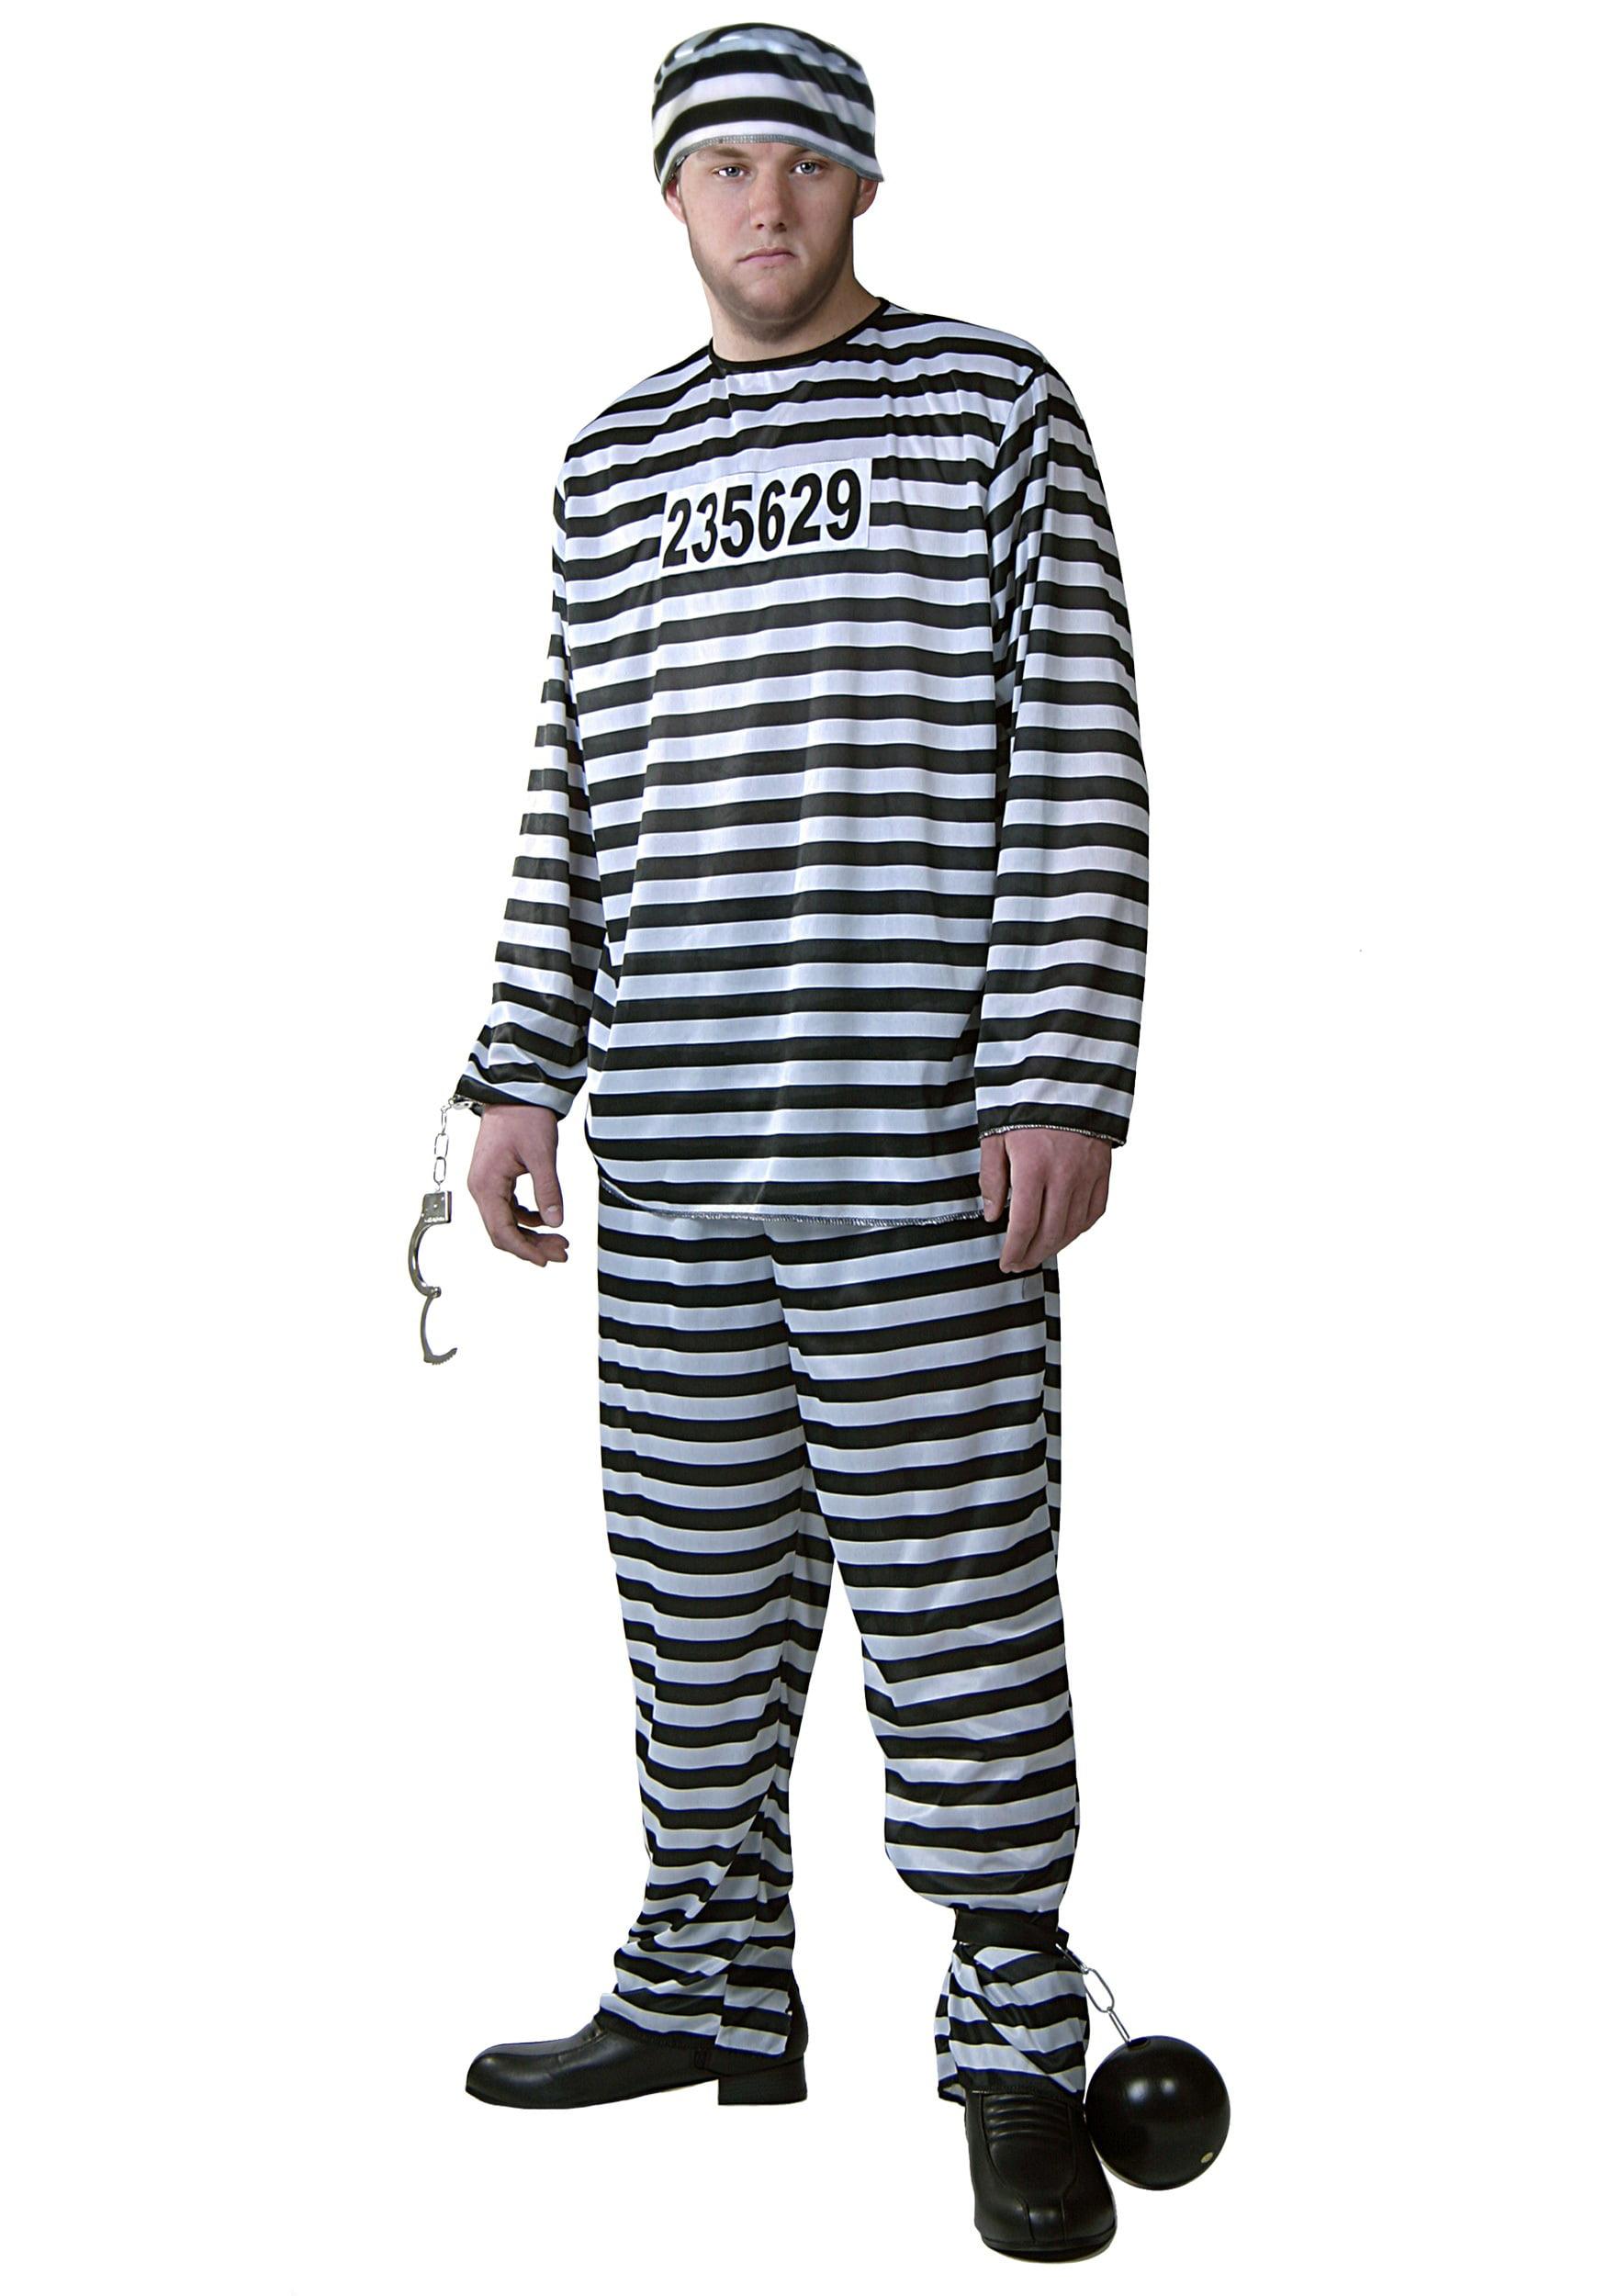 Mens Prisoner Costume Prison Jumpsuit Costumes Walmartcom